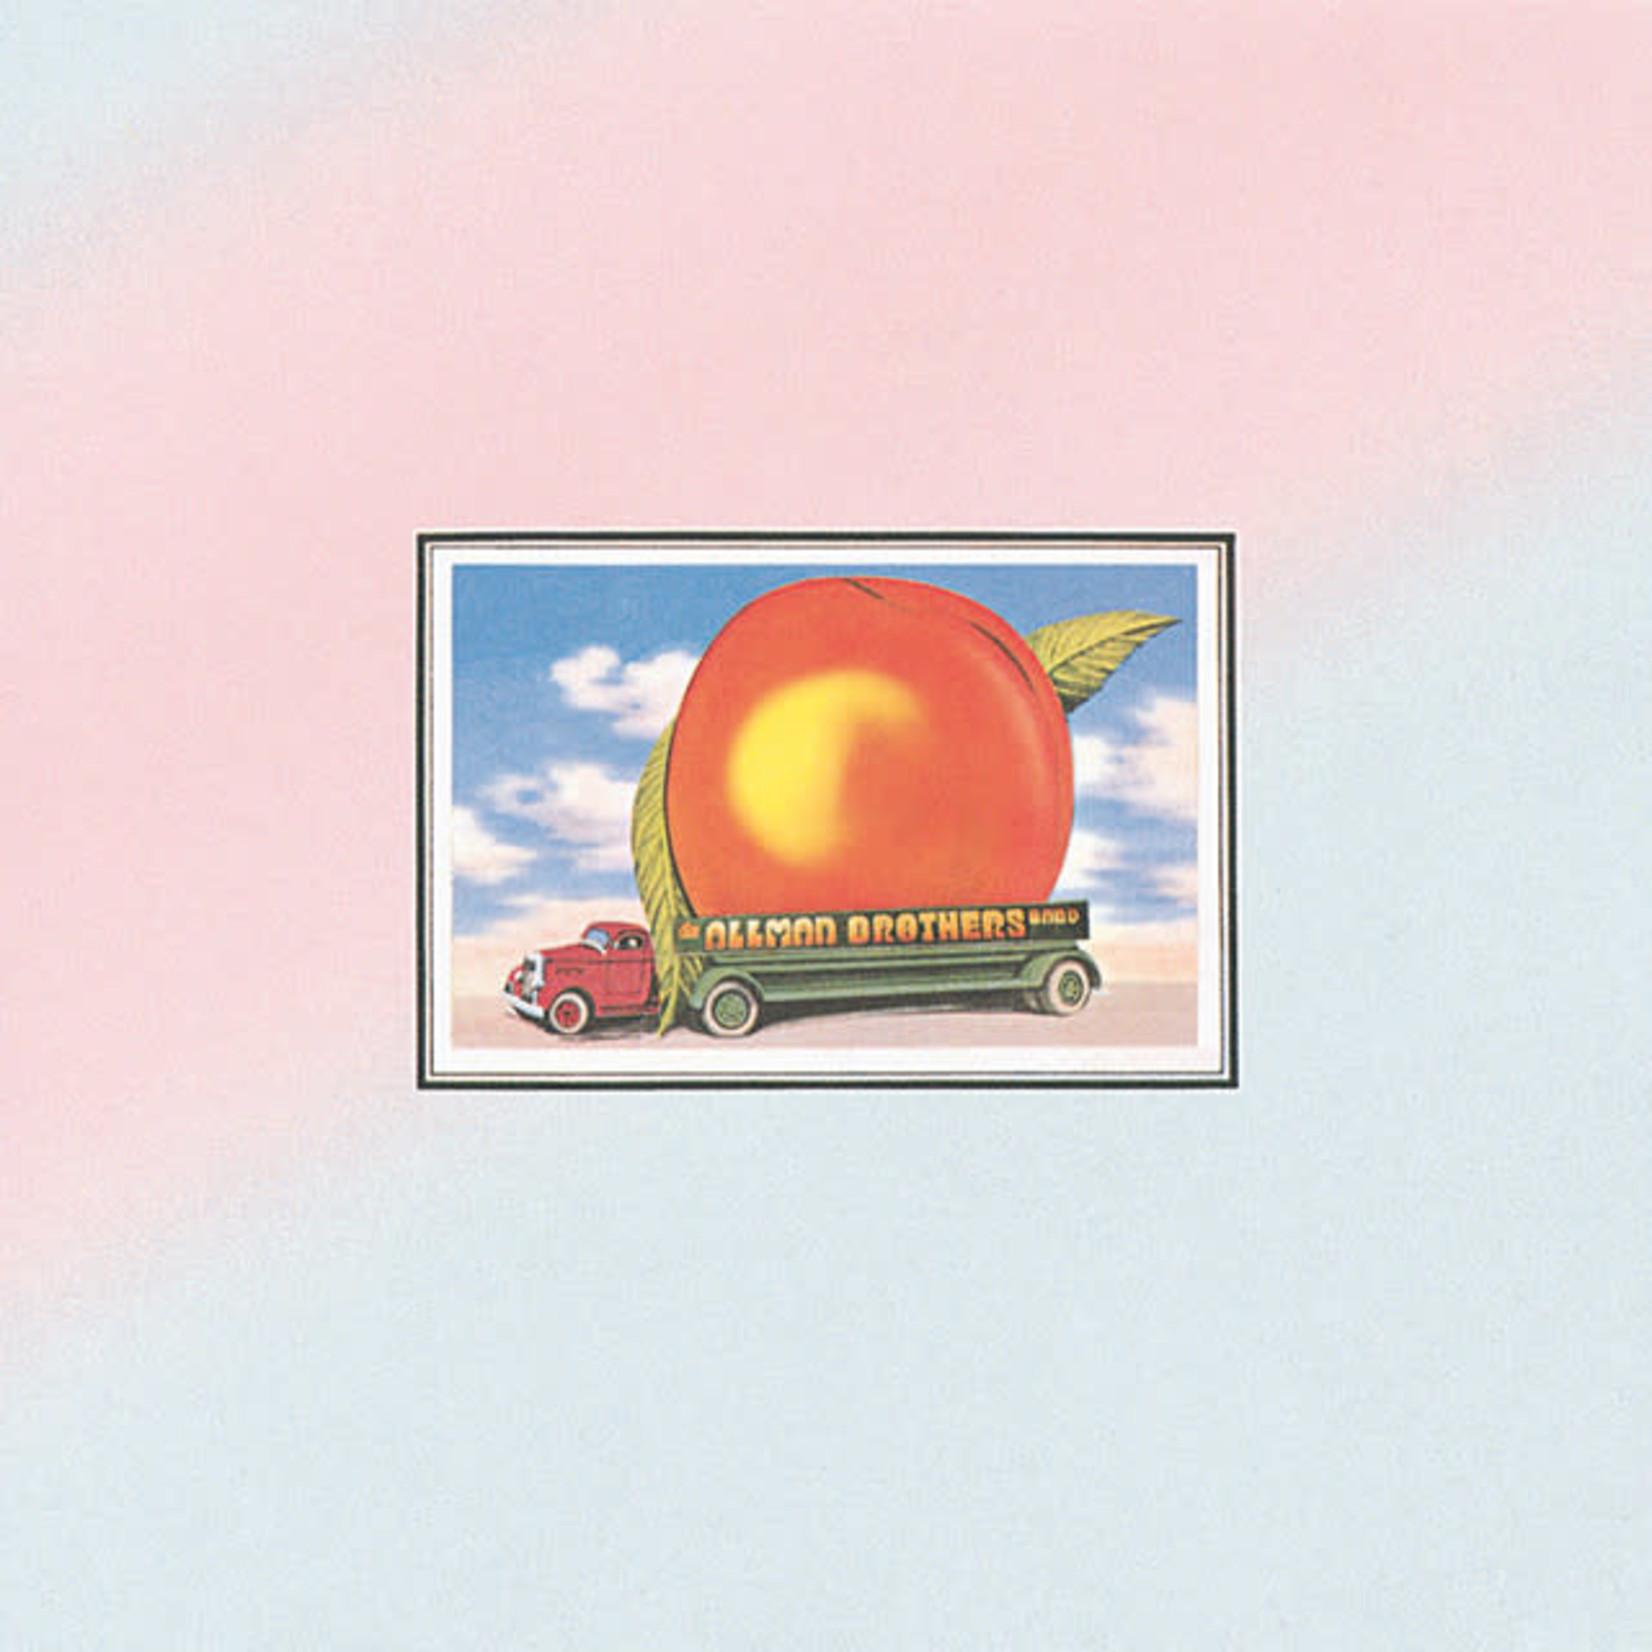 Vinyl The Allman Brothers Band - Eat A Peach